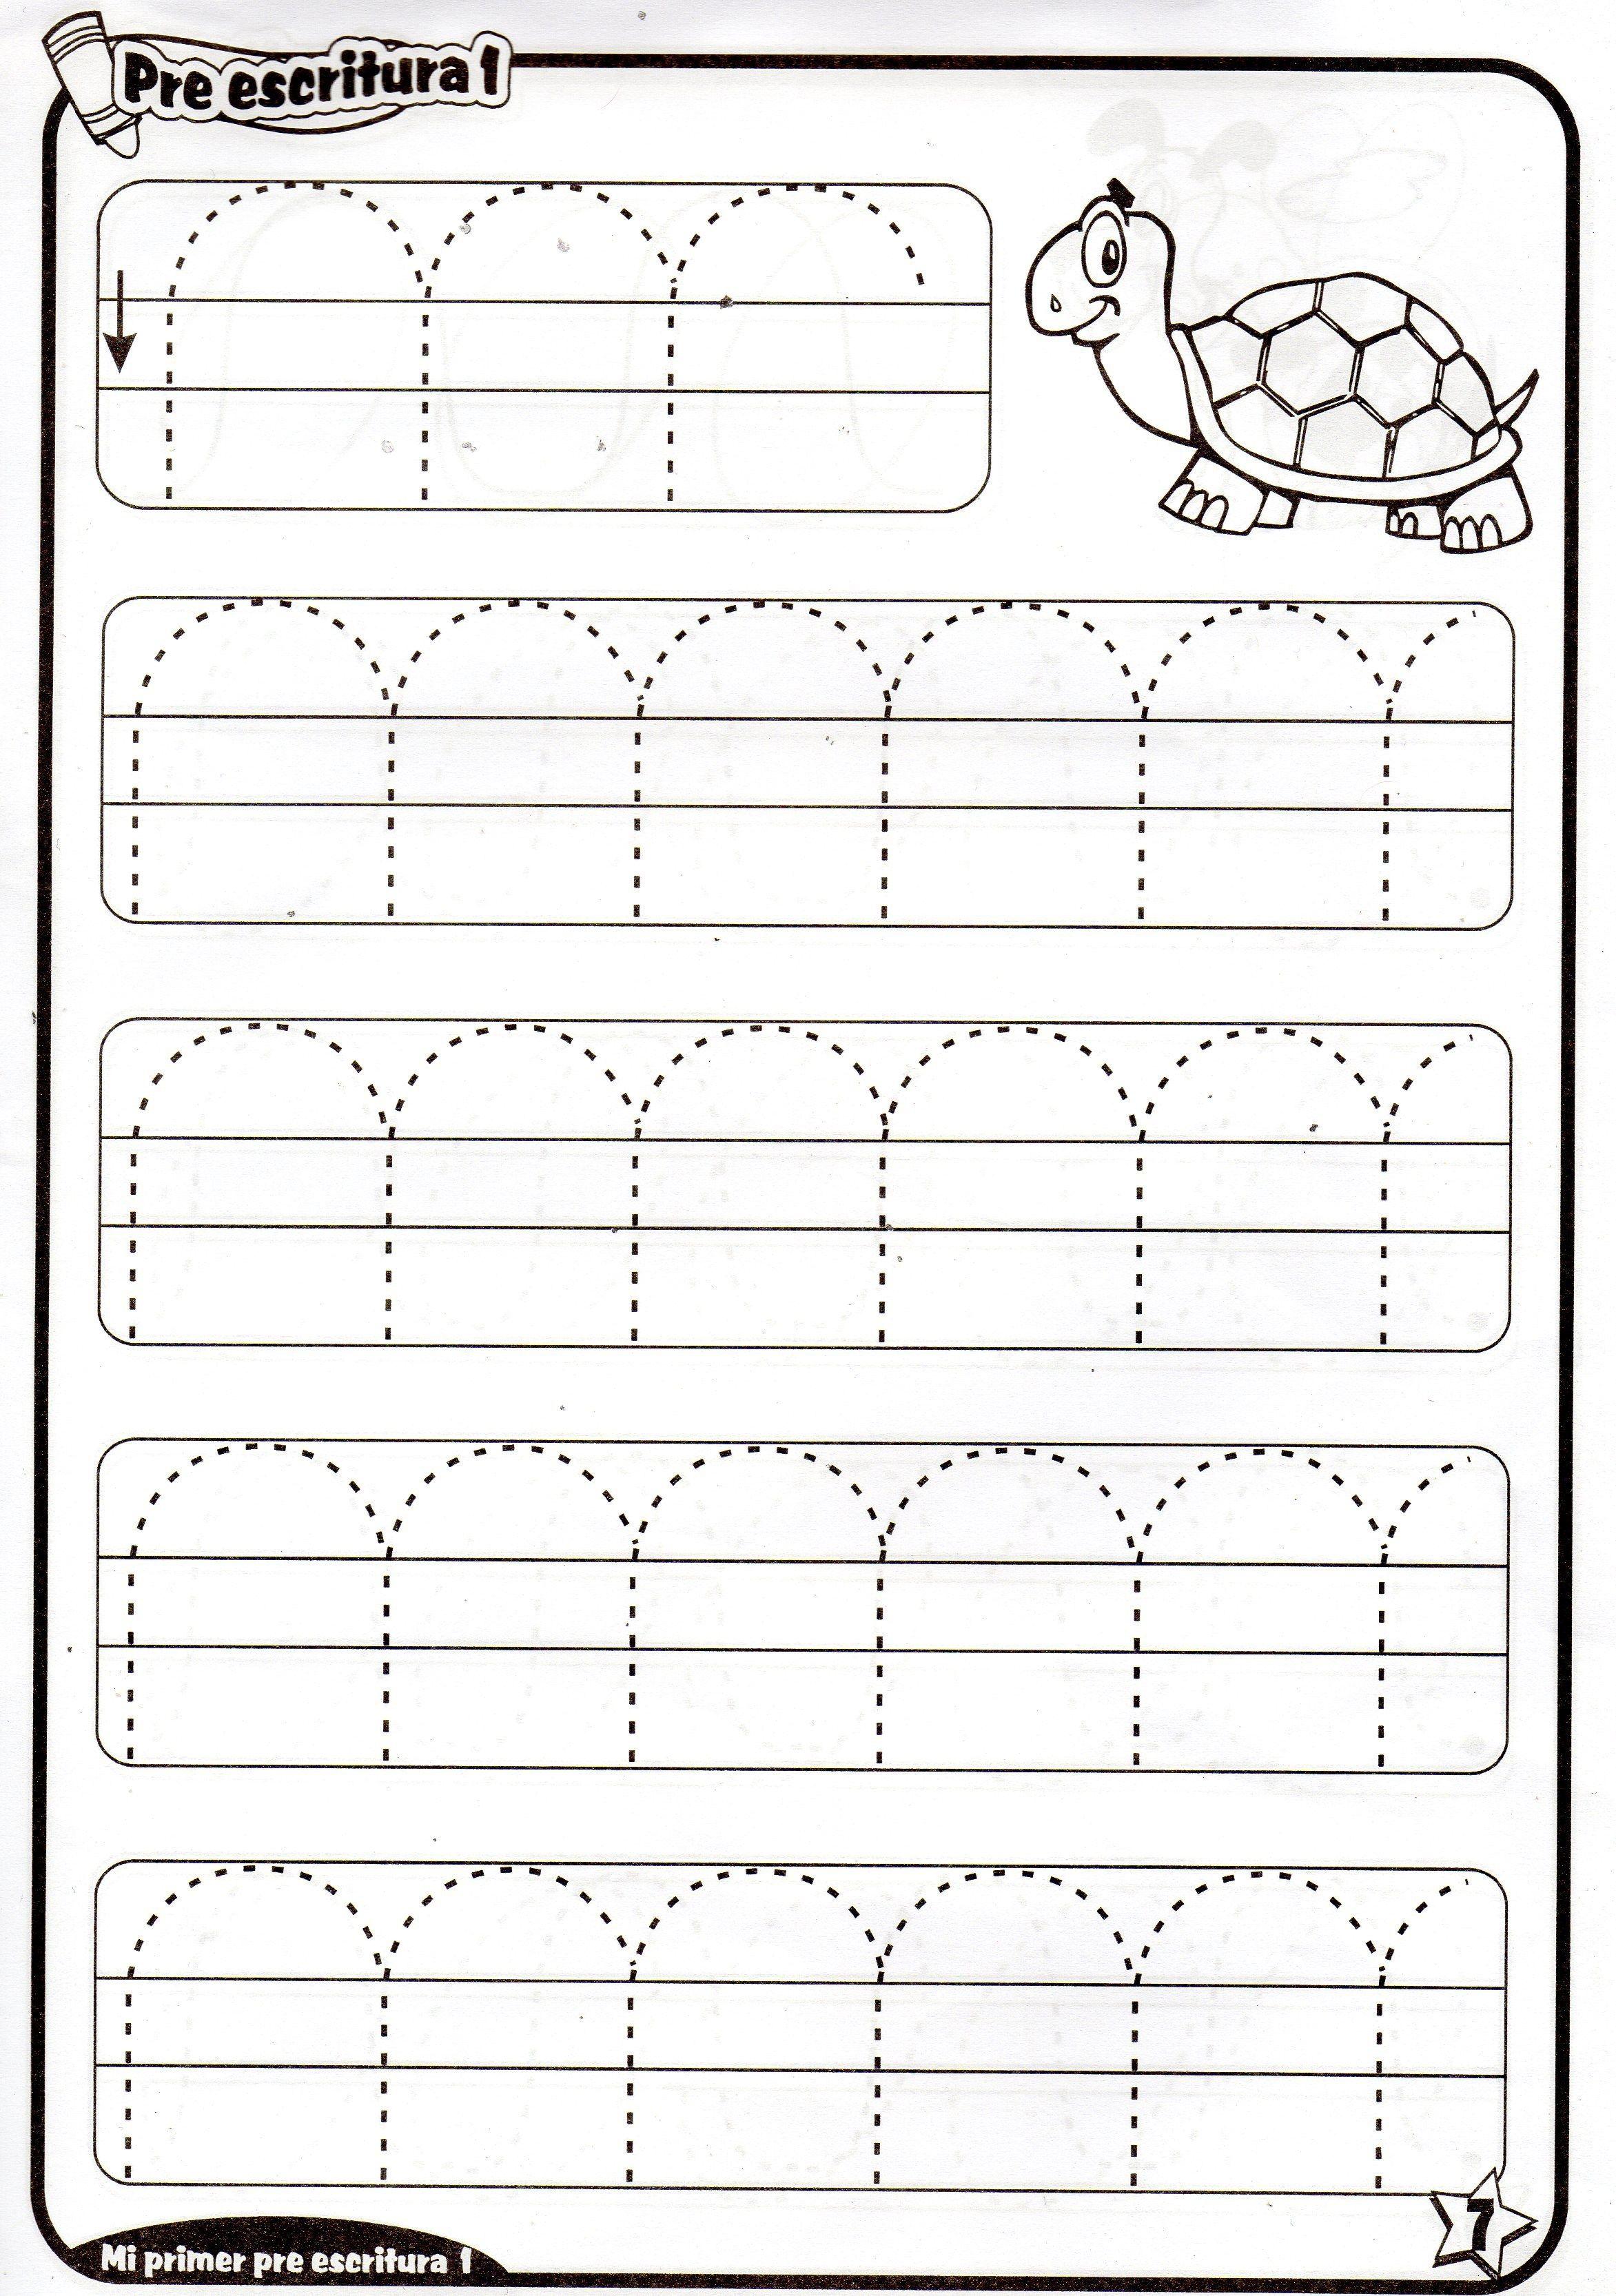 Fichas De Preescritura Imprimibles Para Ninos De 4 Anos